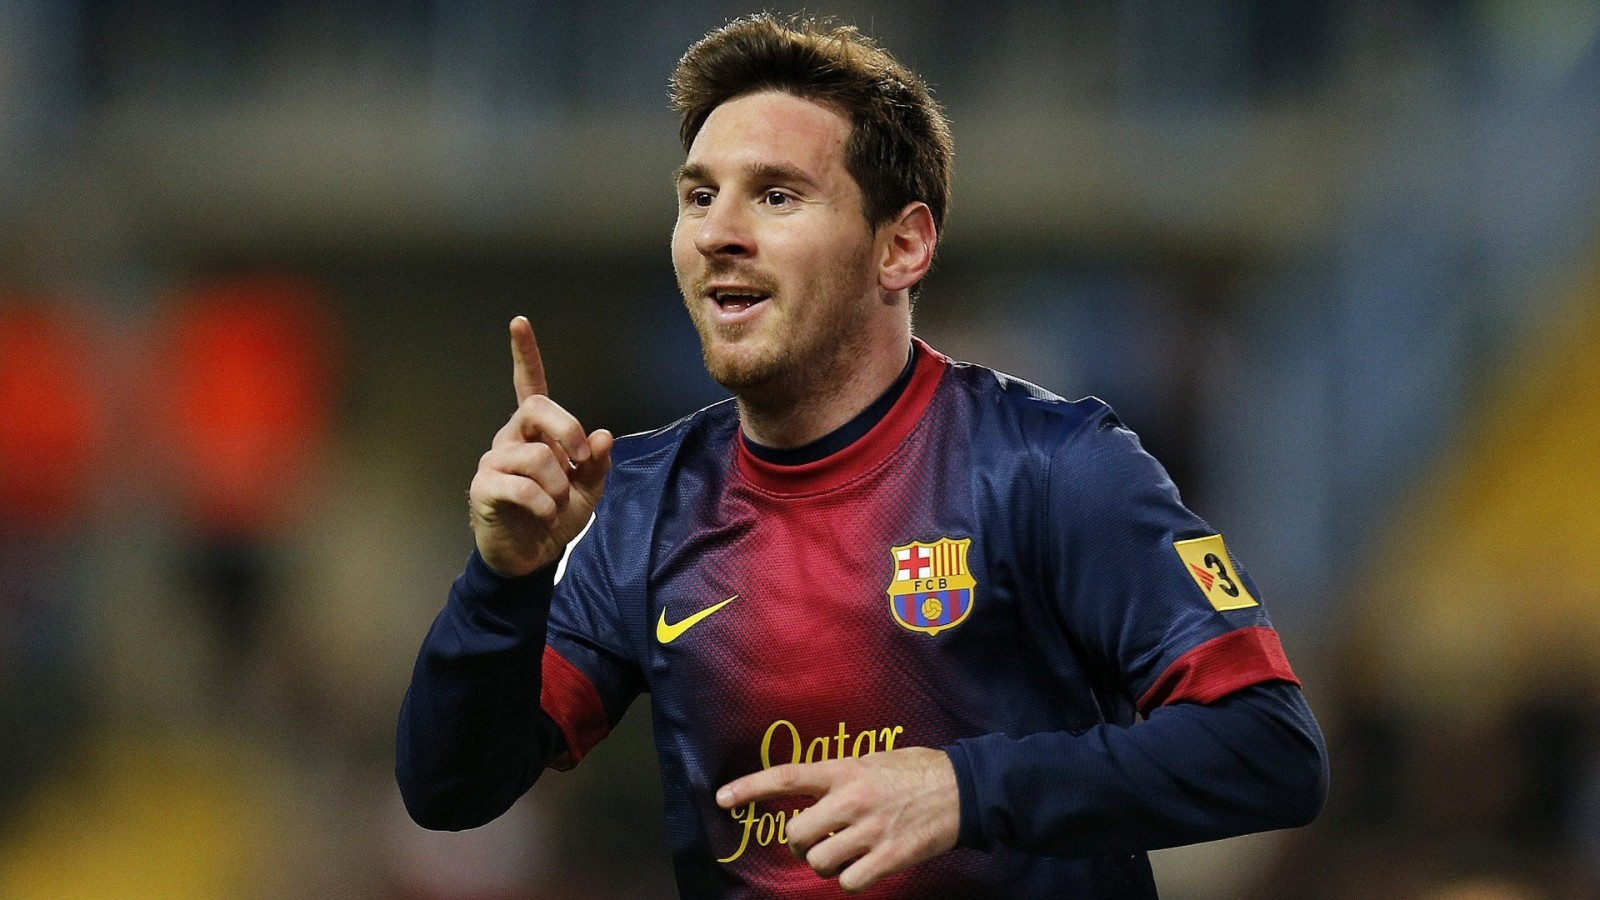 http://en.africatopsports.com/wp-content/uploads/2014/02/Lionel-Messi.jpg